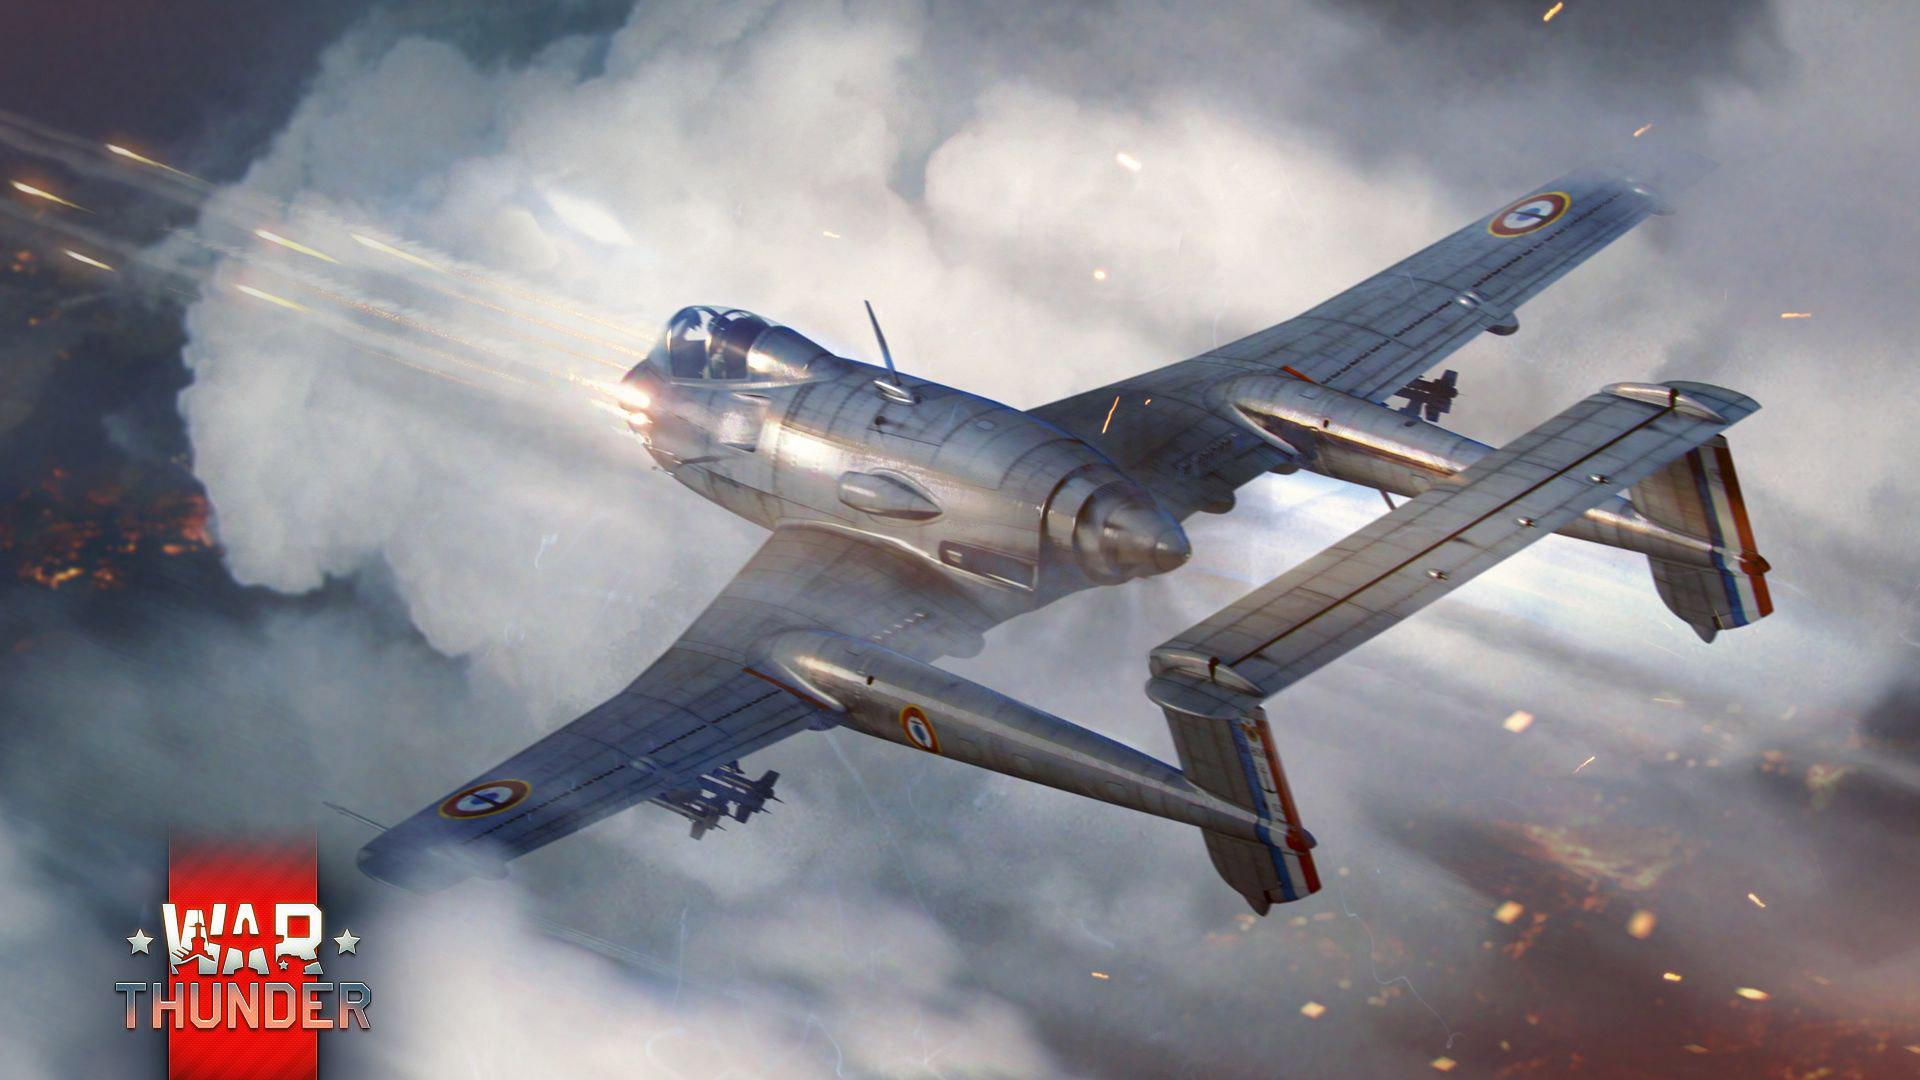 War Thunder Wallpaper in 1920x1080